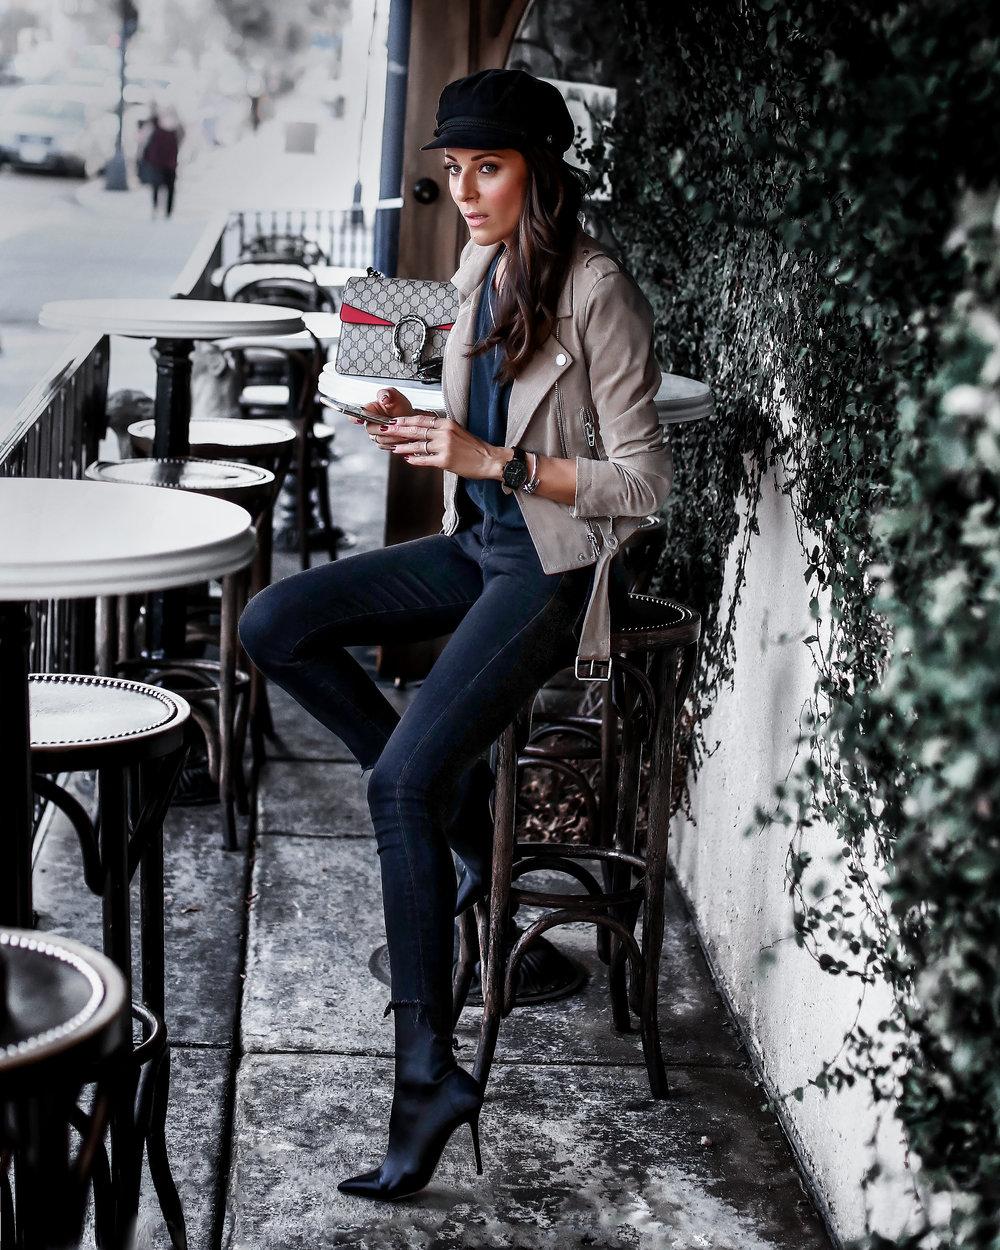 Blank NNYC Suede Jacket Black Skinny Jeans Tony Bianco Sock Boots.jpg